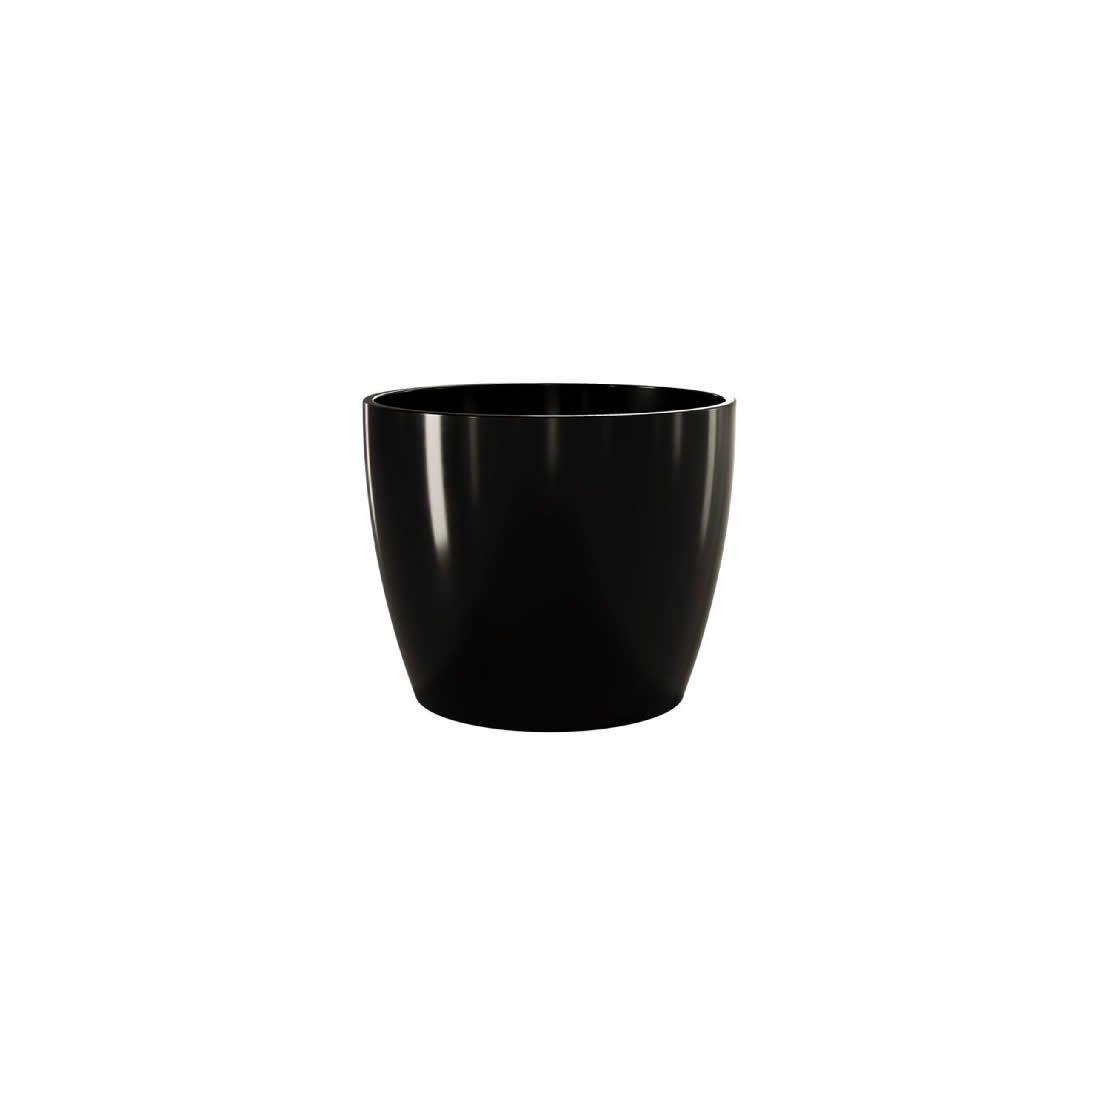 Vaso Para Planta Cerâmico Munique Preto 11 - Japi